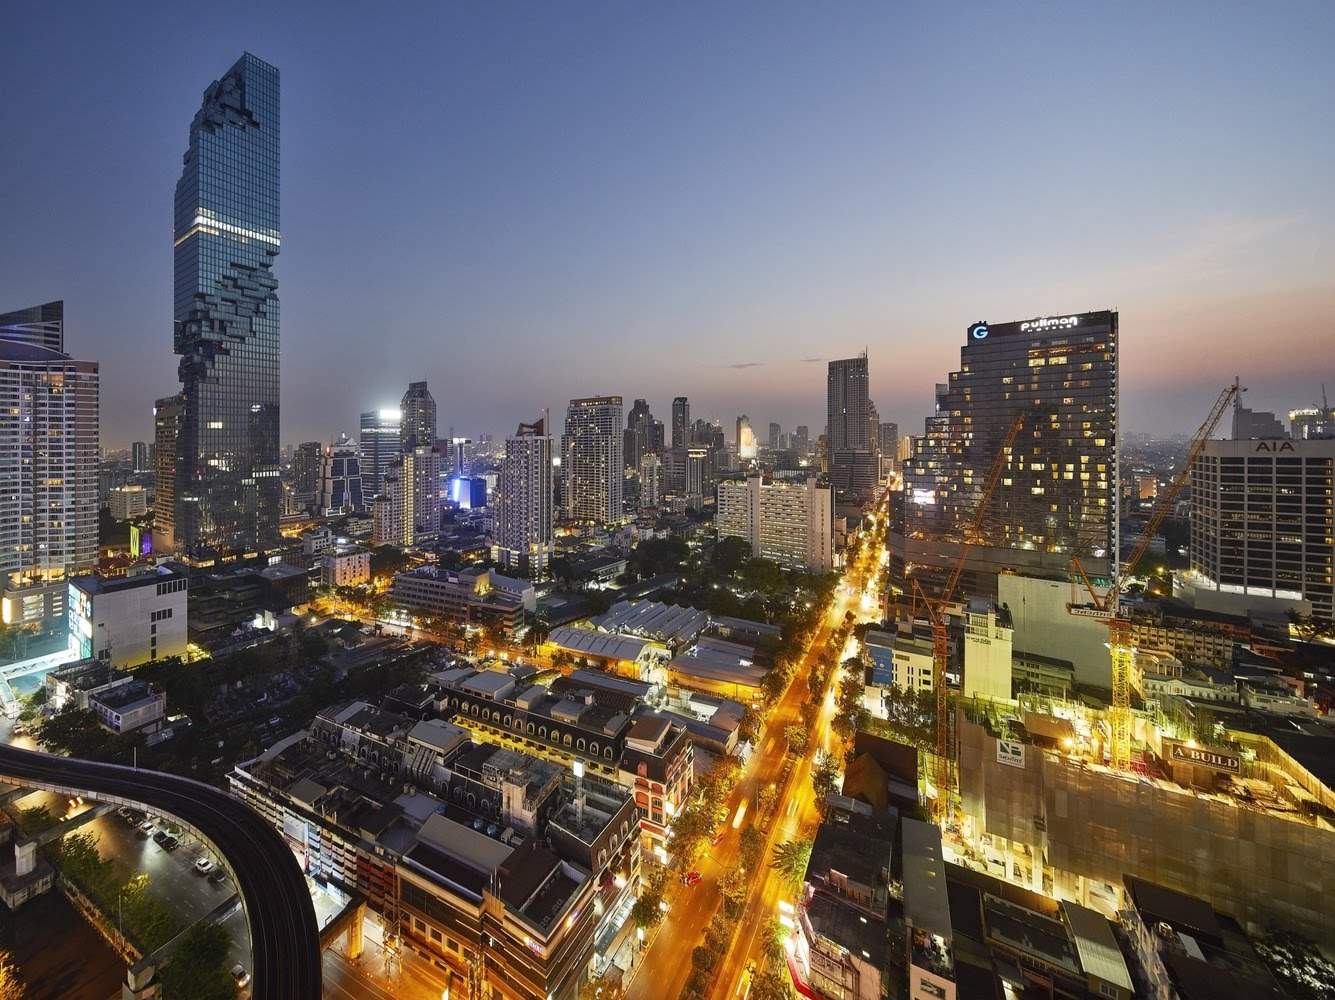 Ole_Scheeren_MahaNakhon_Tower_Bangkok_©Hufton_Crow_IGS Magazine_23